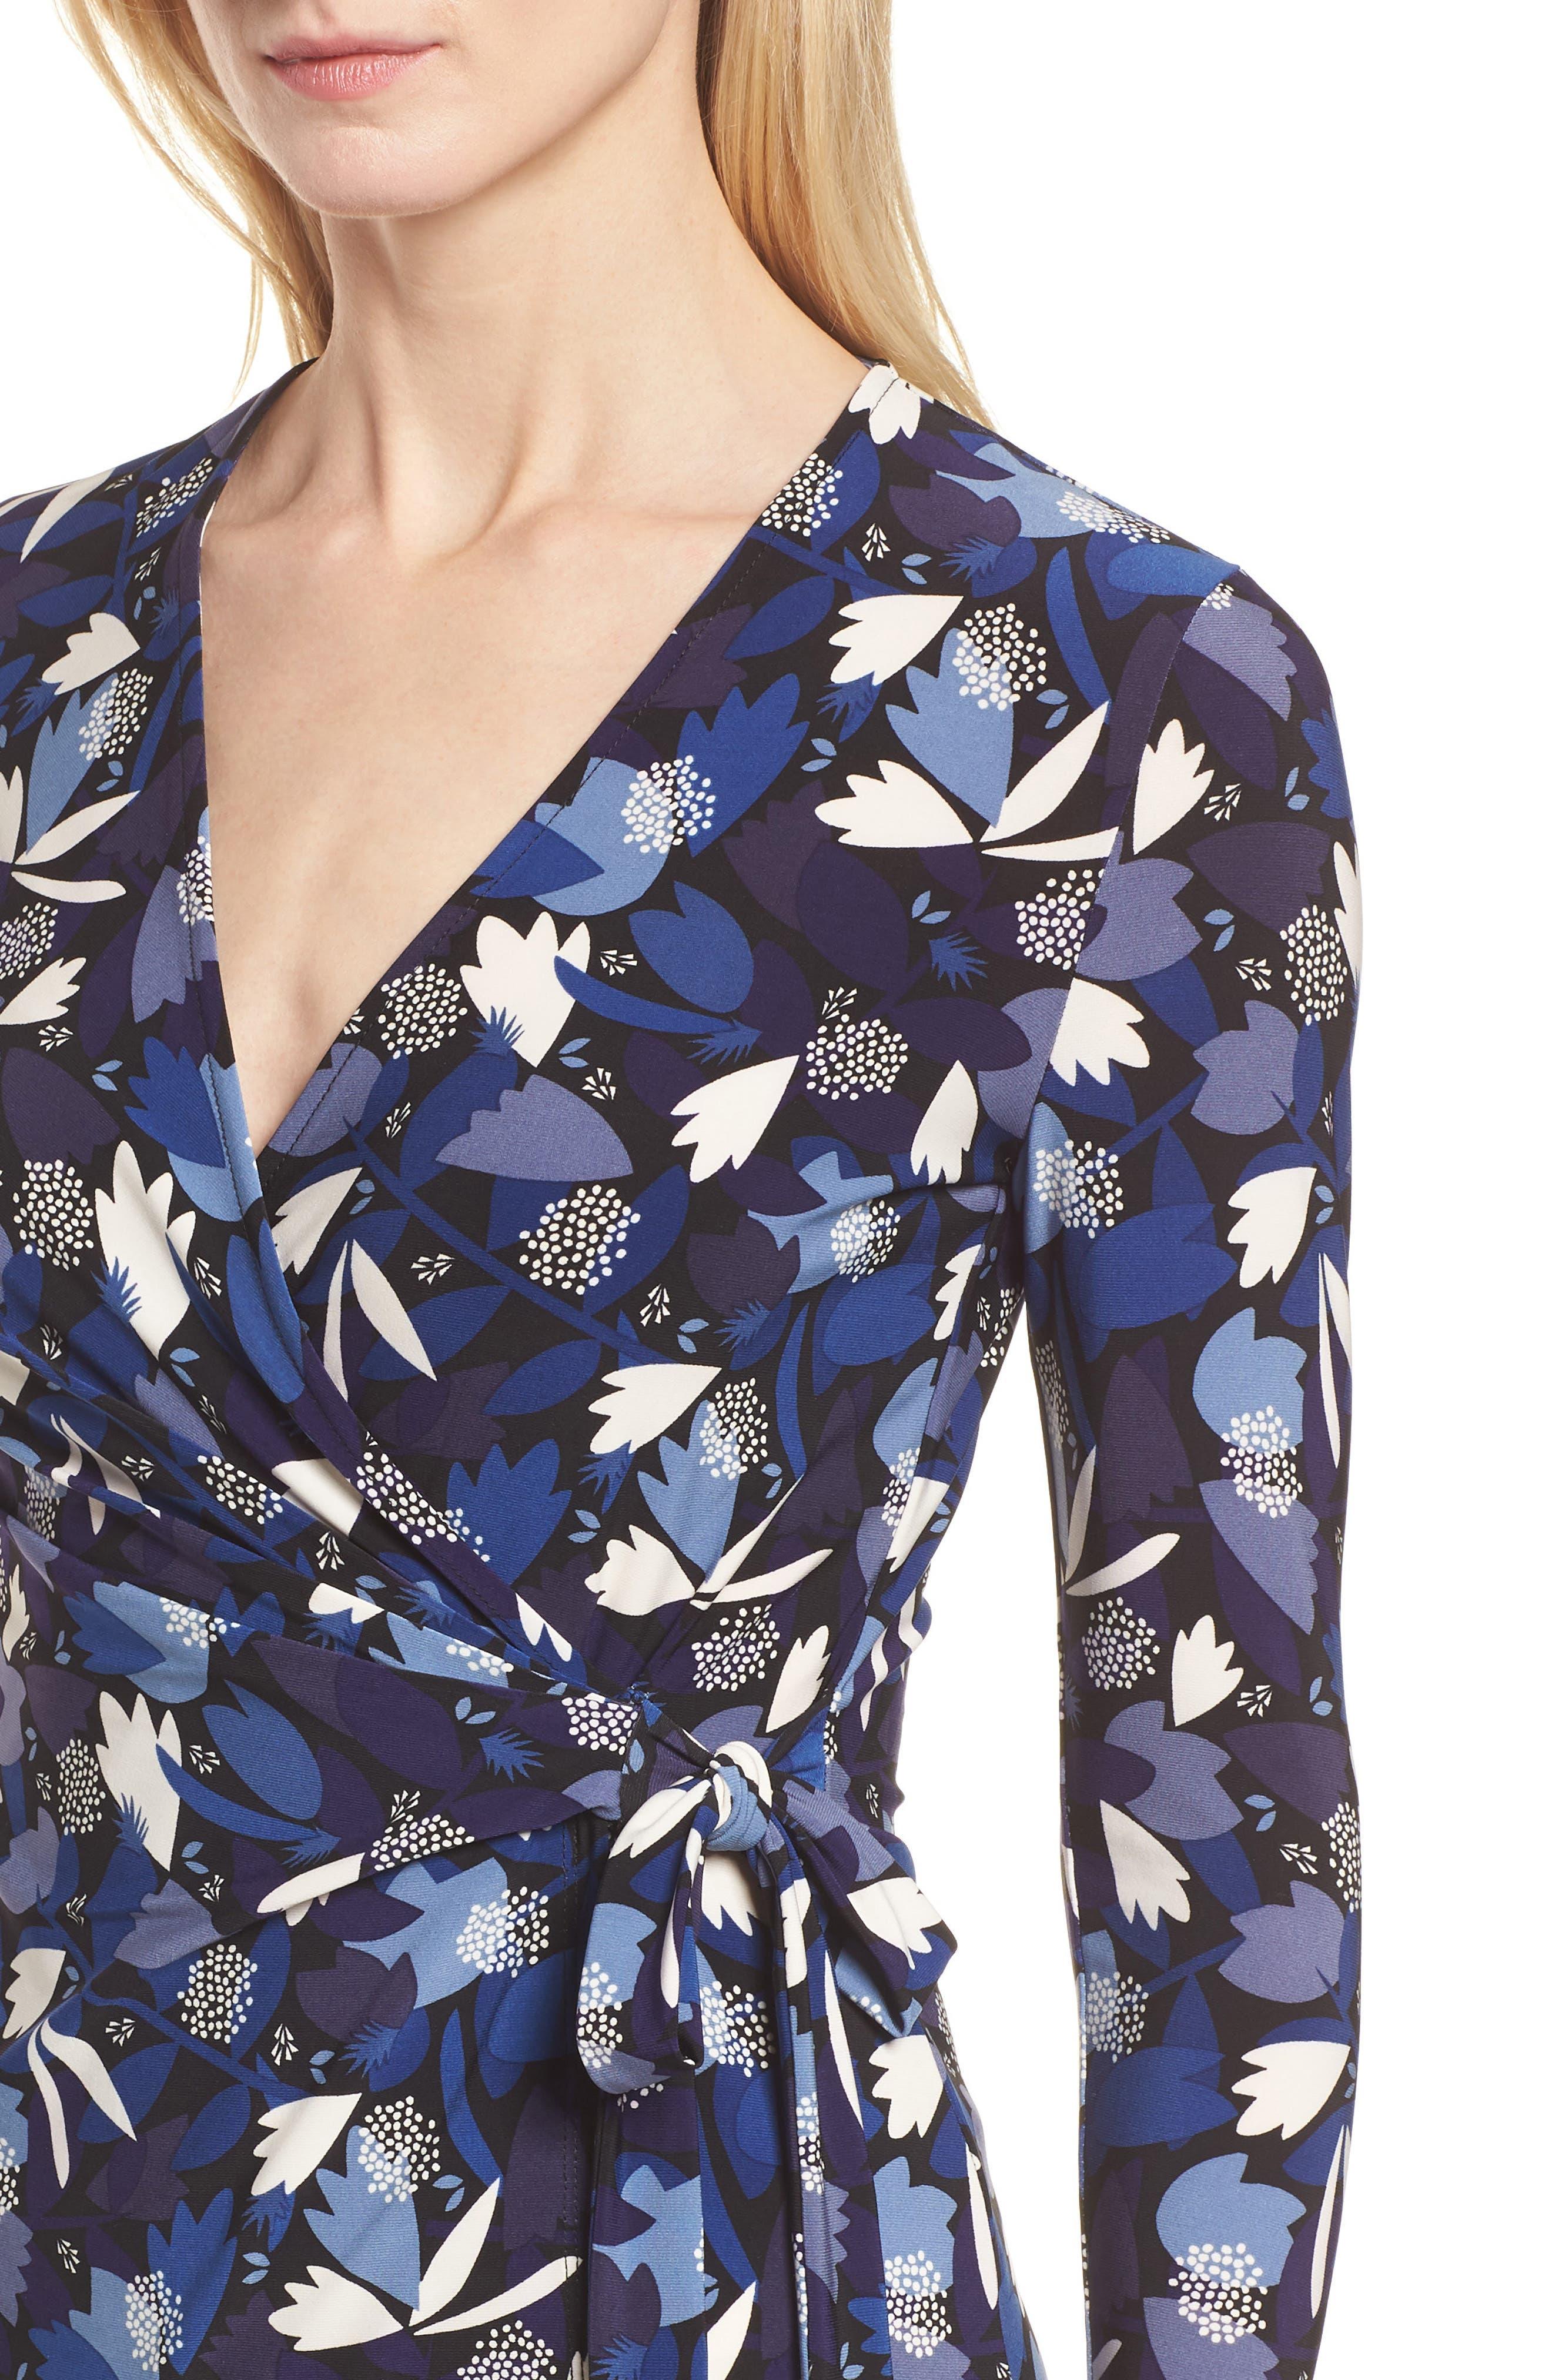 Amalfi Print Faux Wrap Top,                             Alternate thumbnail 4, color,                             410